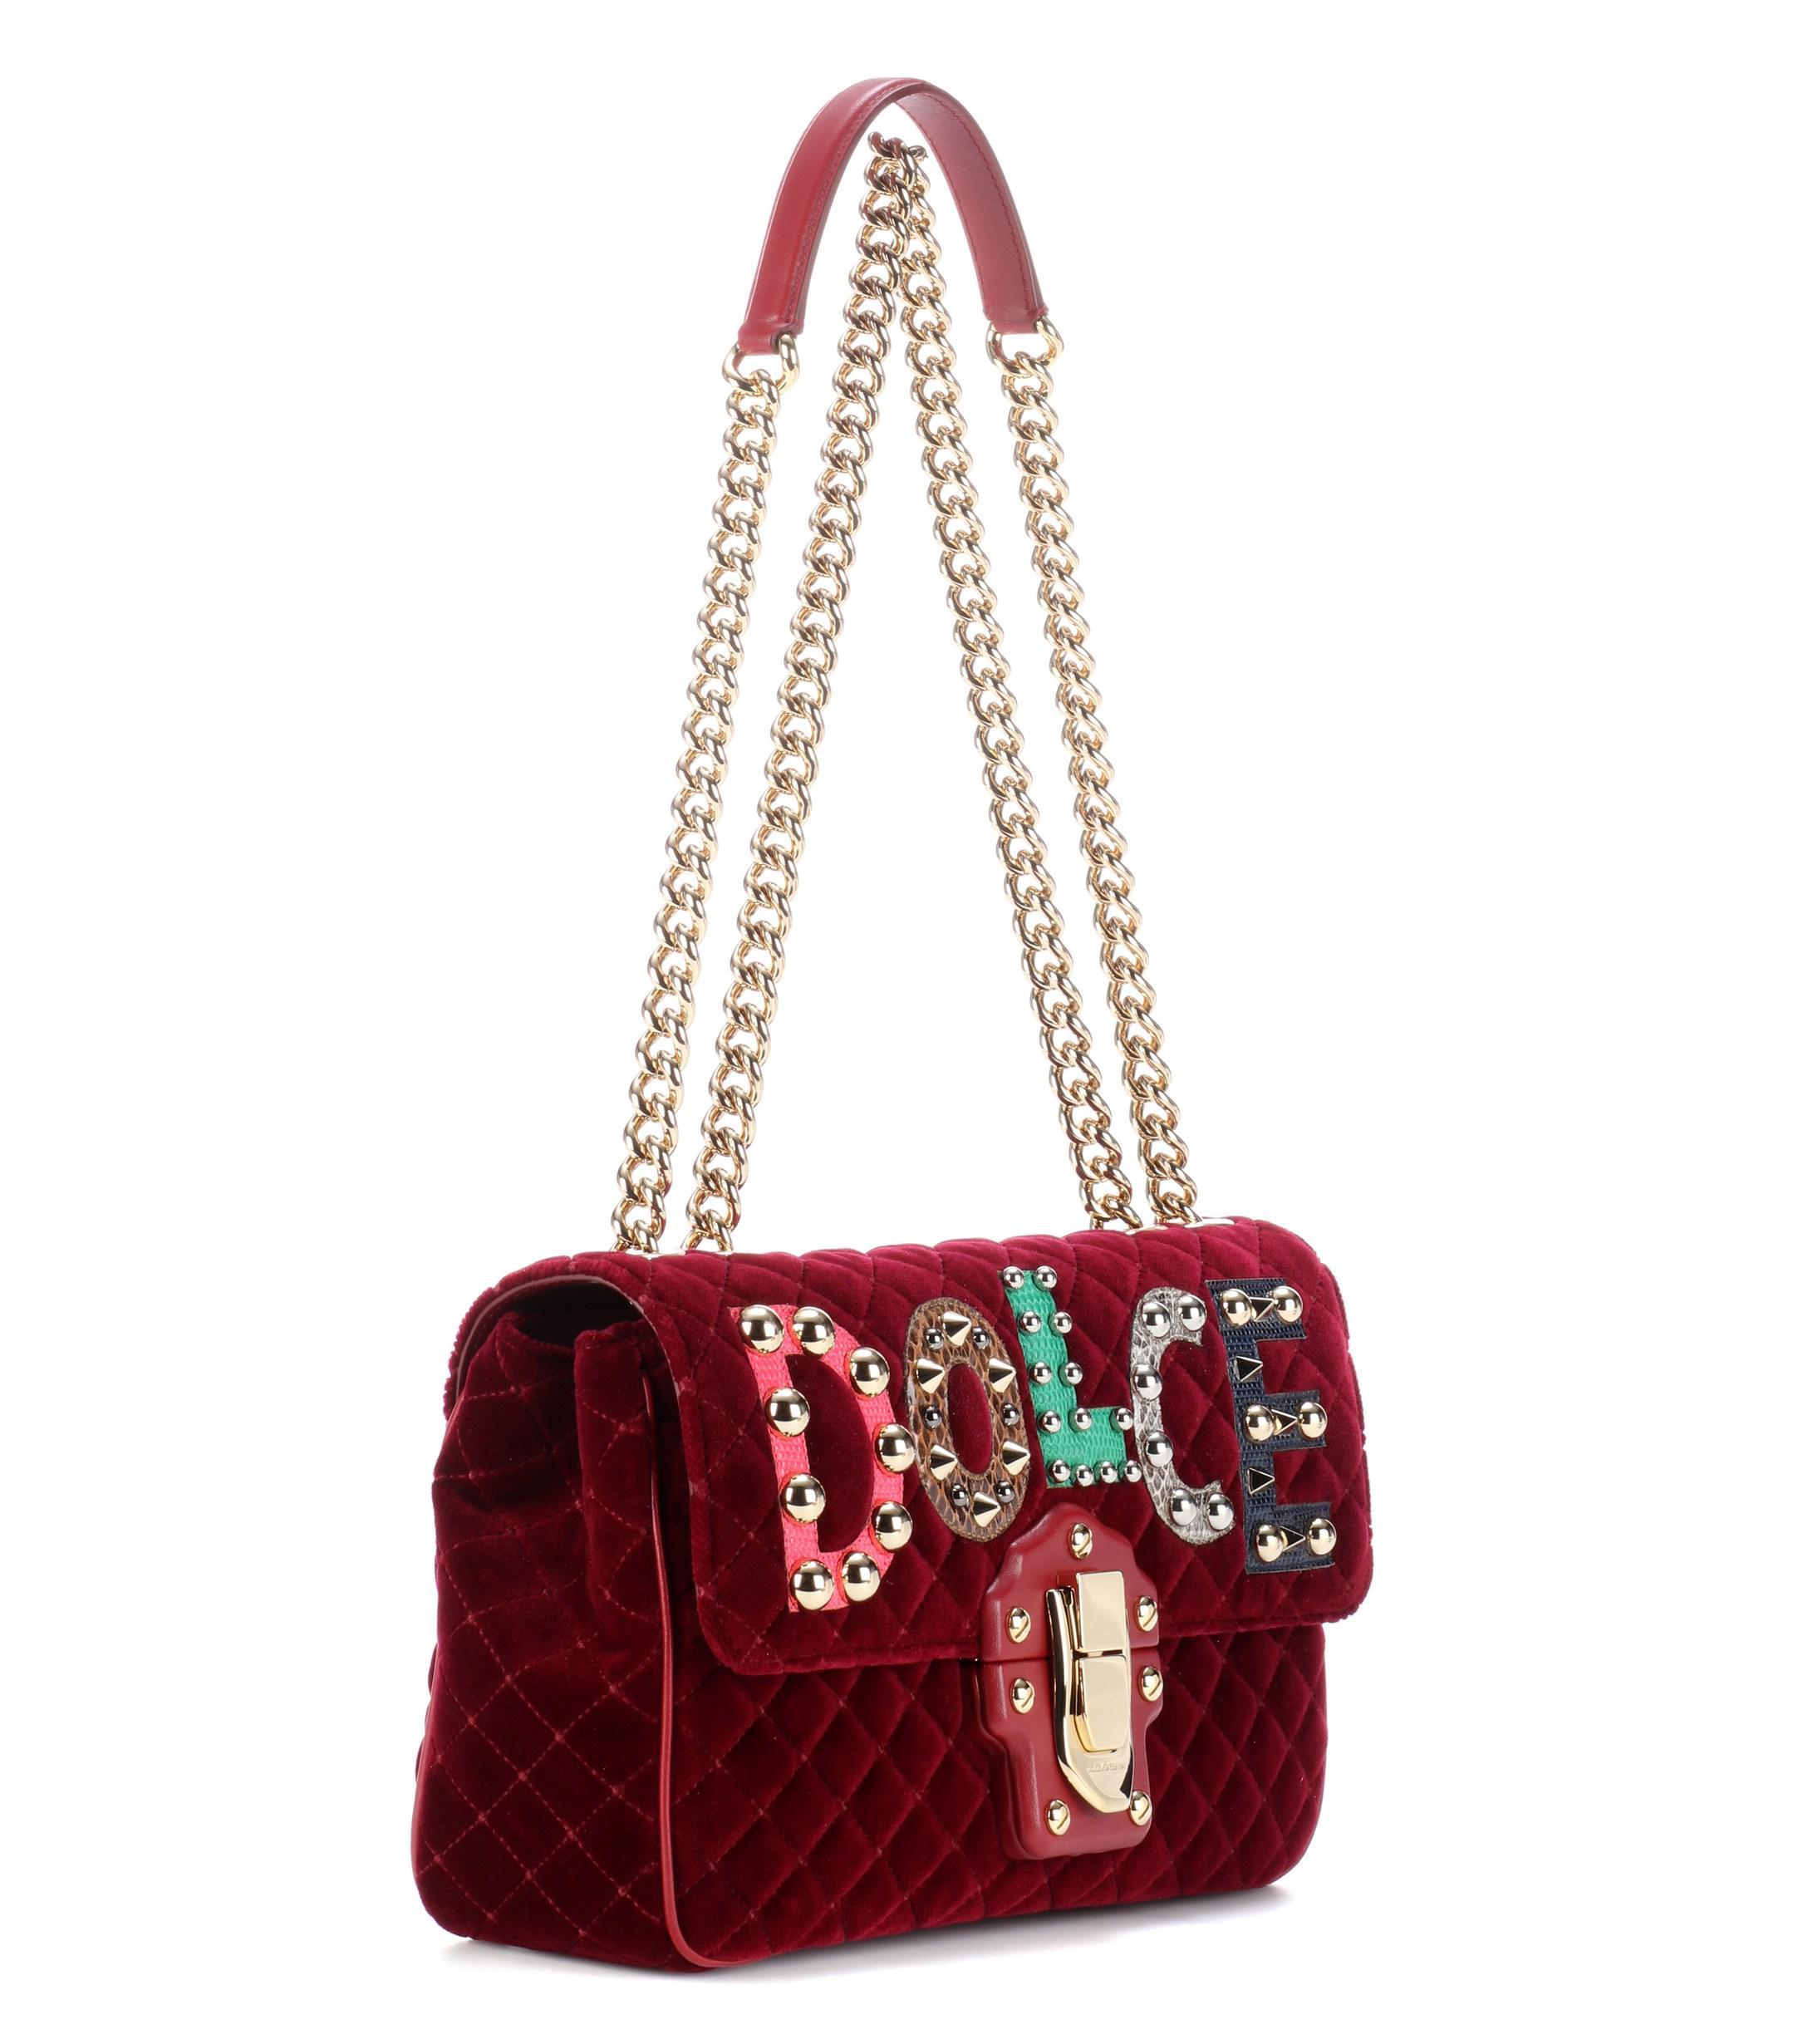 ed859eebafe5 Lyst - Dolce   Gabbana Lucia Leather And Velvet Shoulder Bag in Red